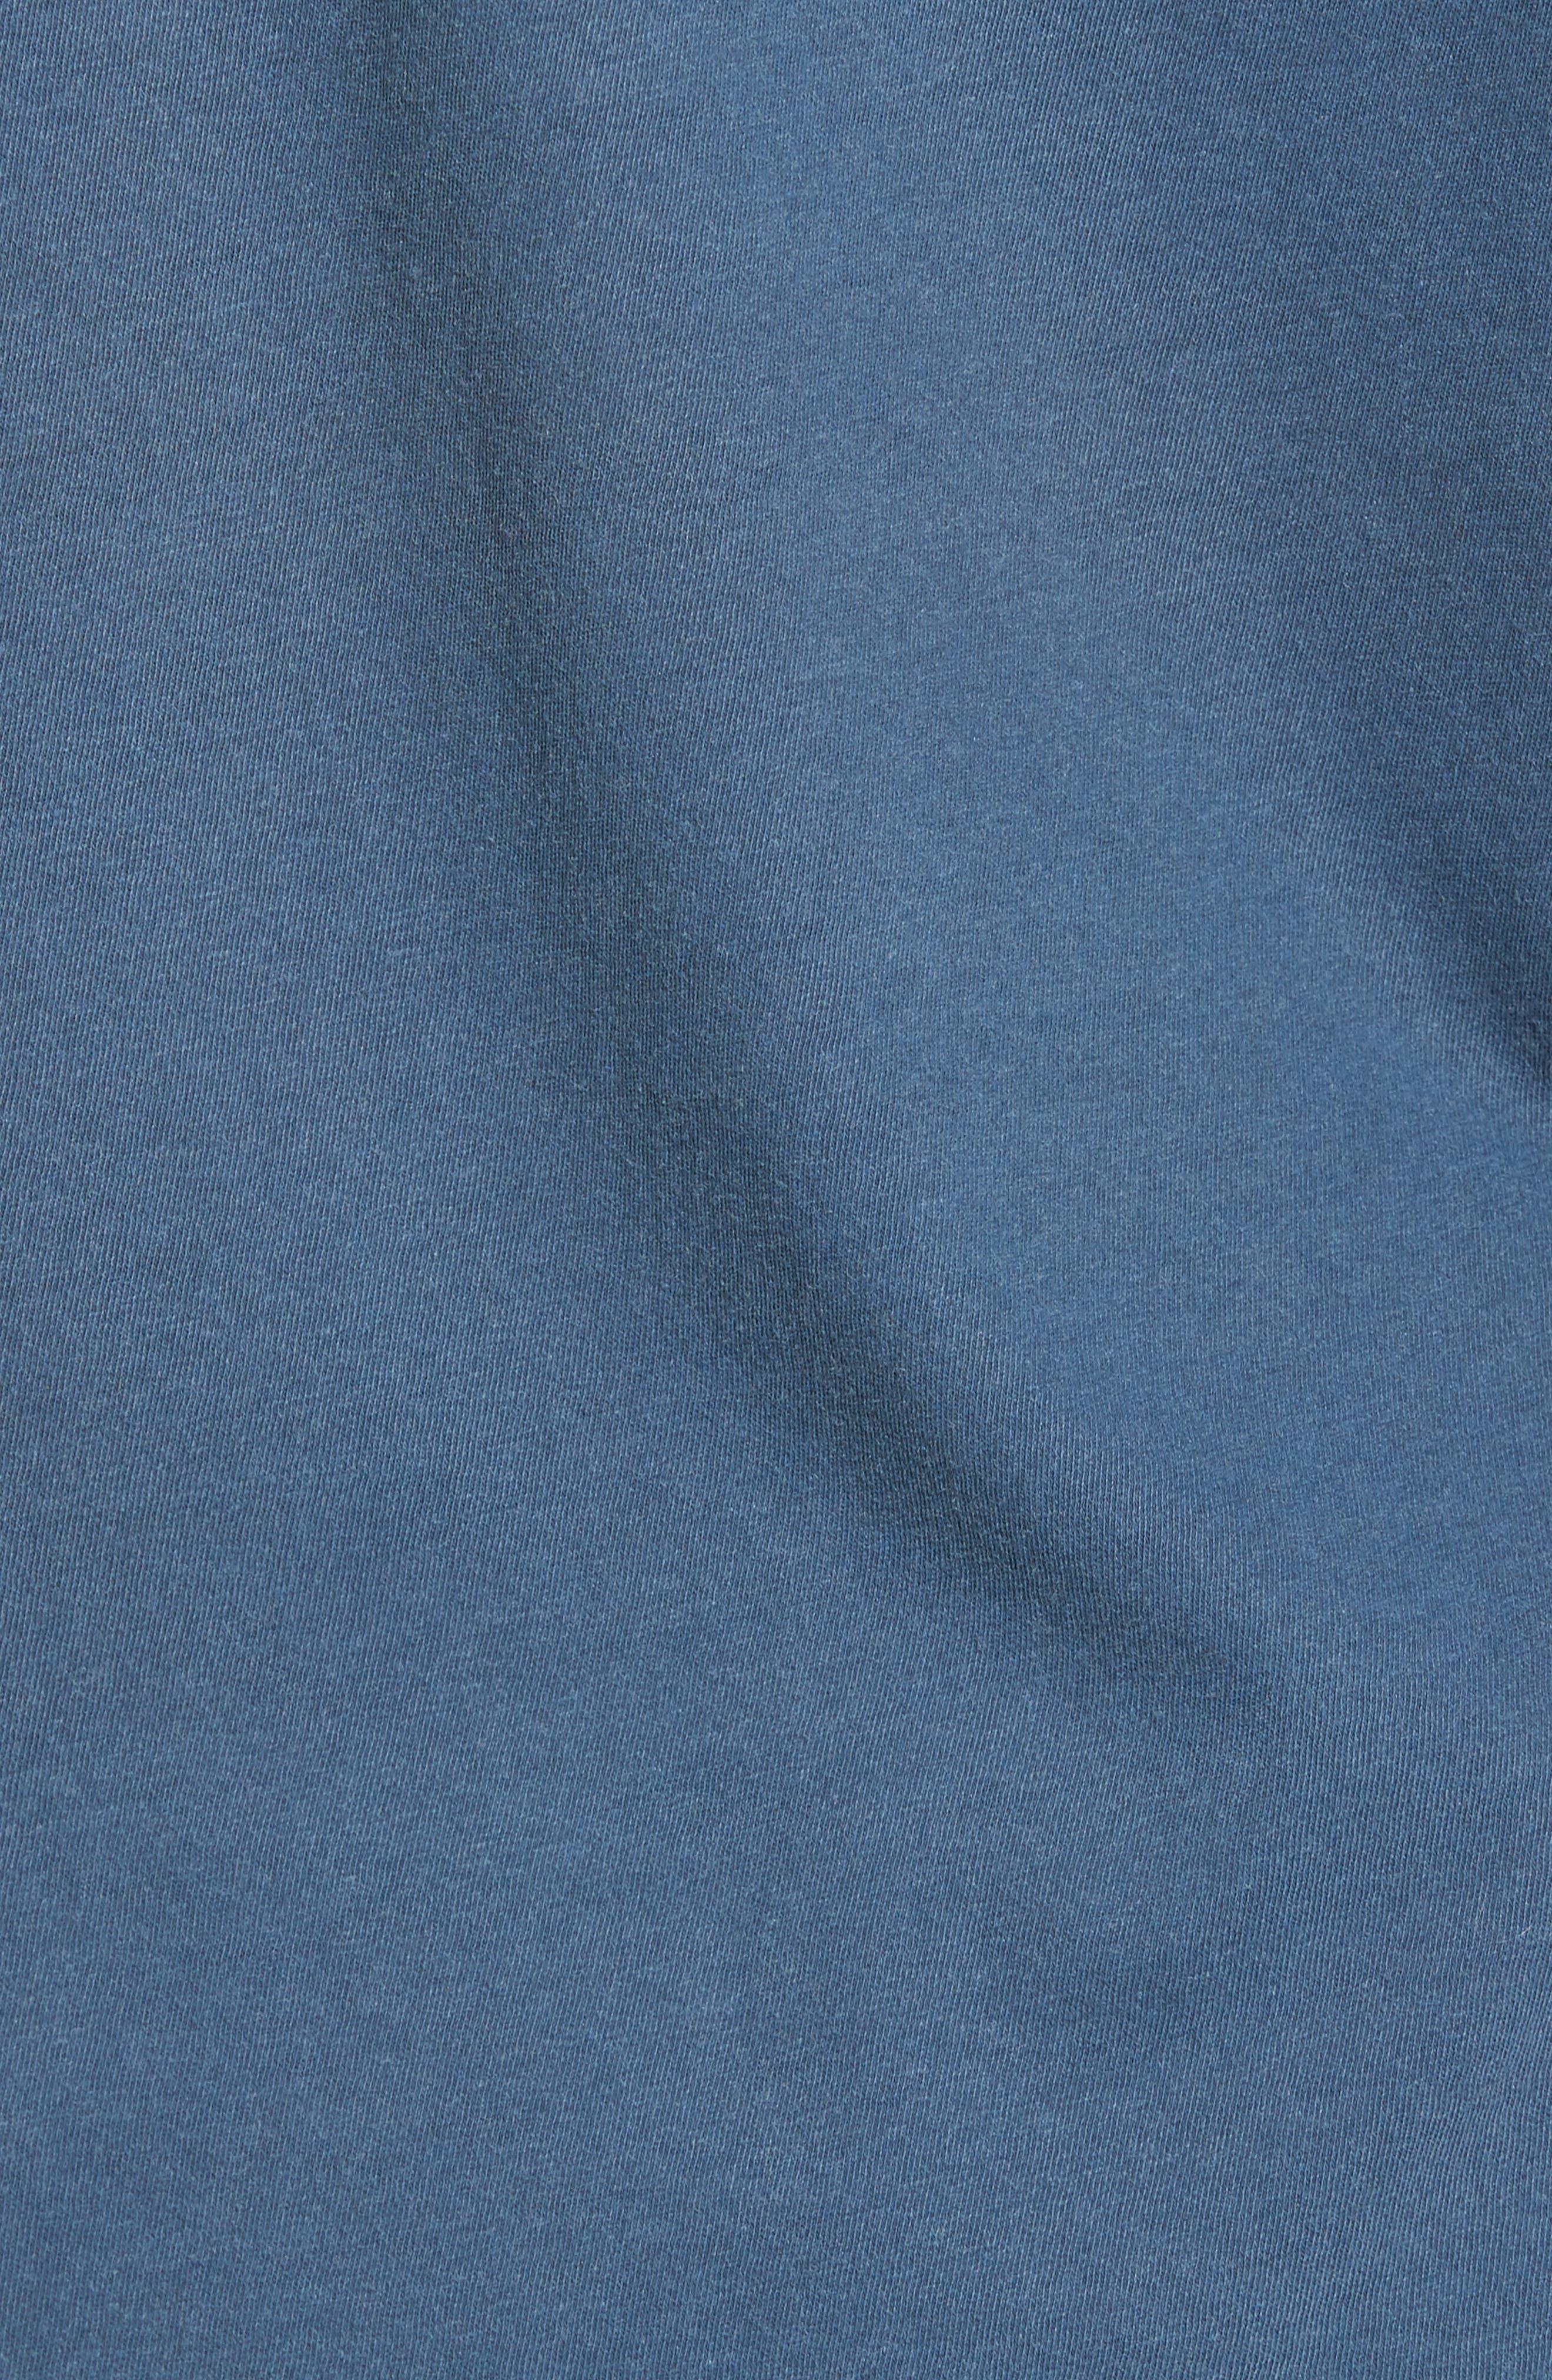 Never Not Having Fun Graphic T-Shirt,                             Alternate thumbnail 5, color,                             Dark Denim